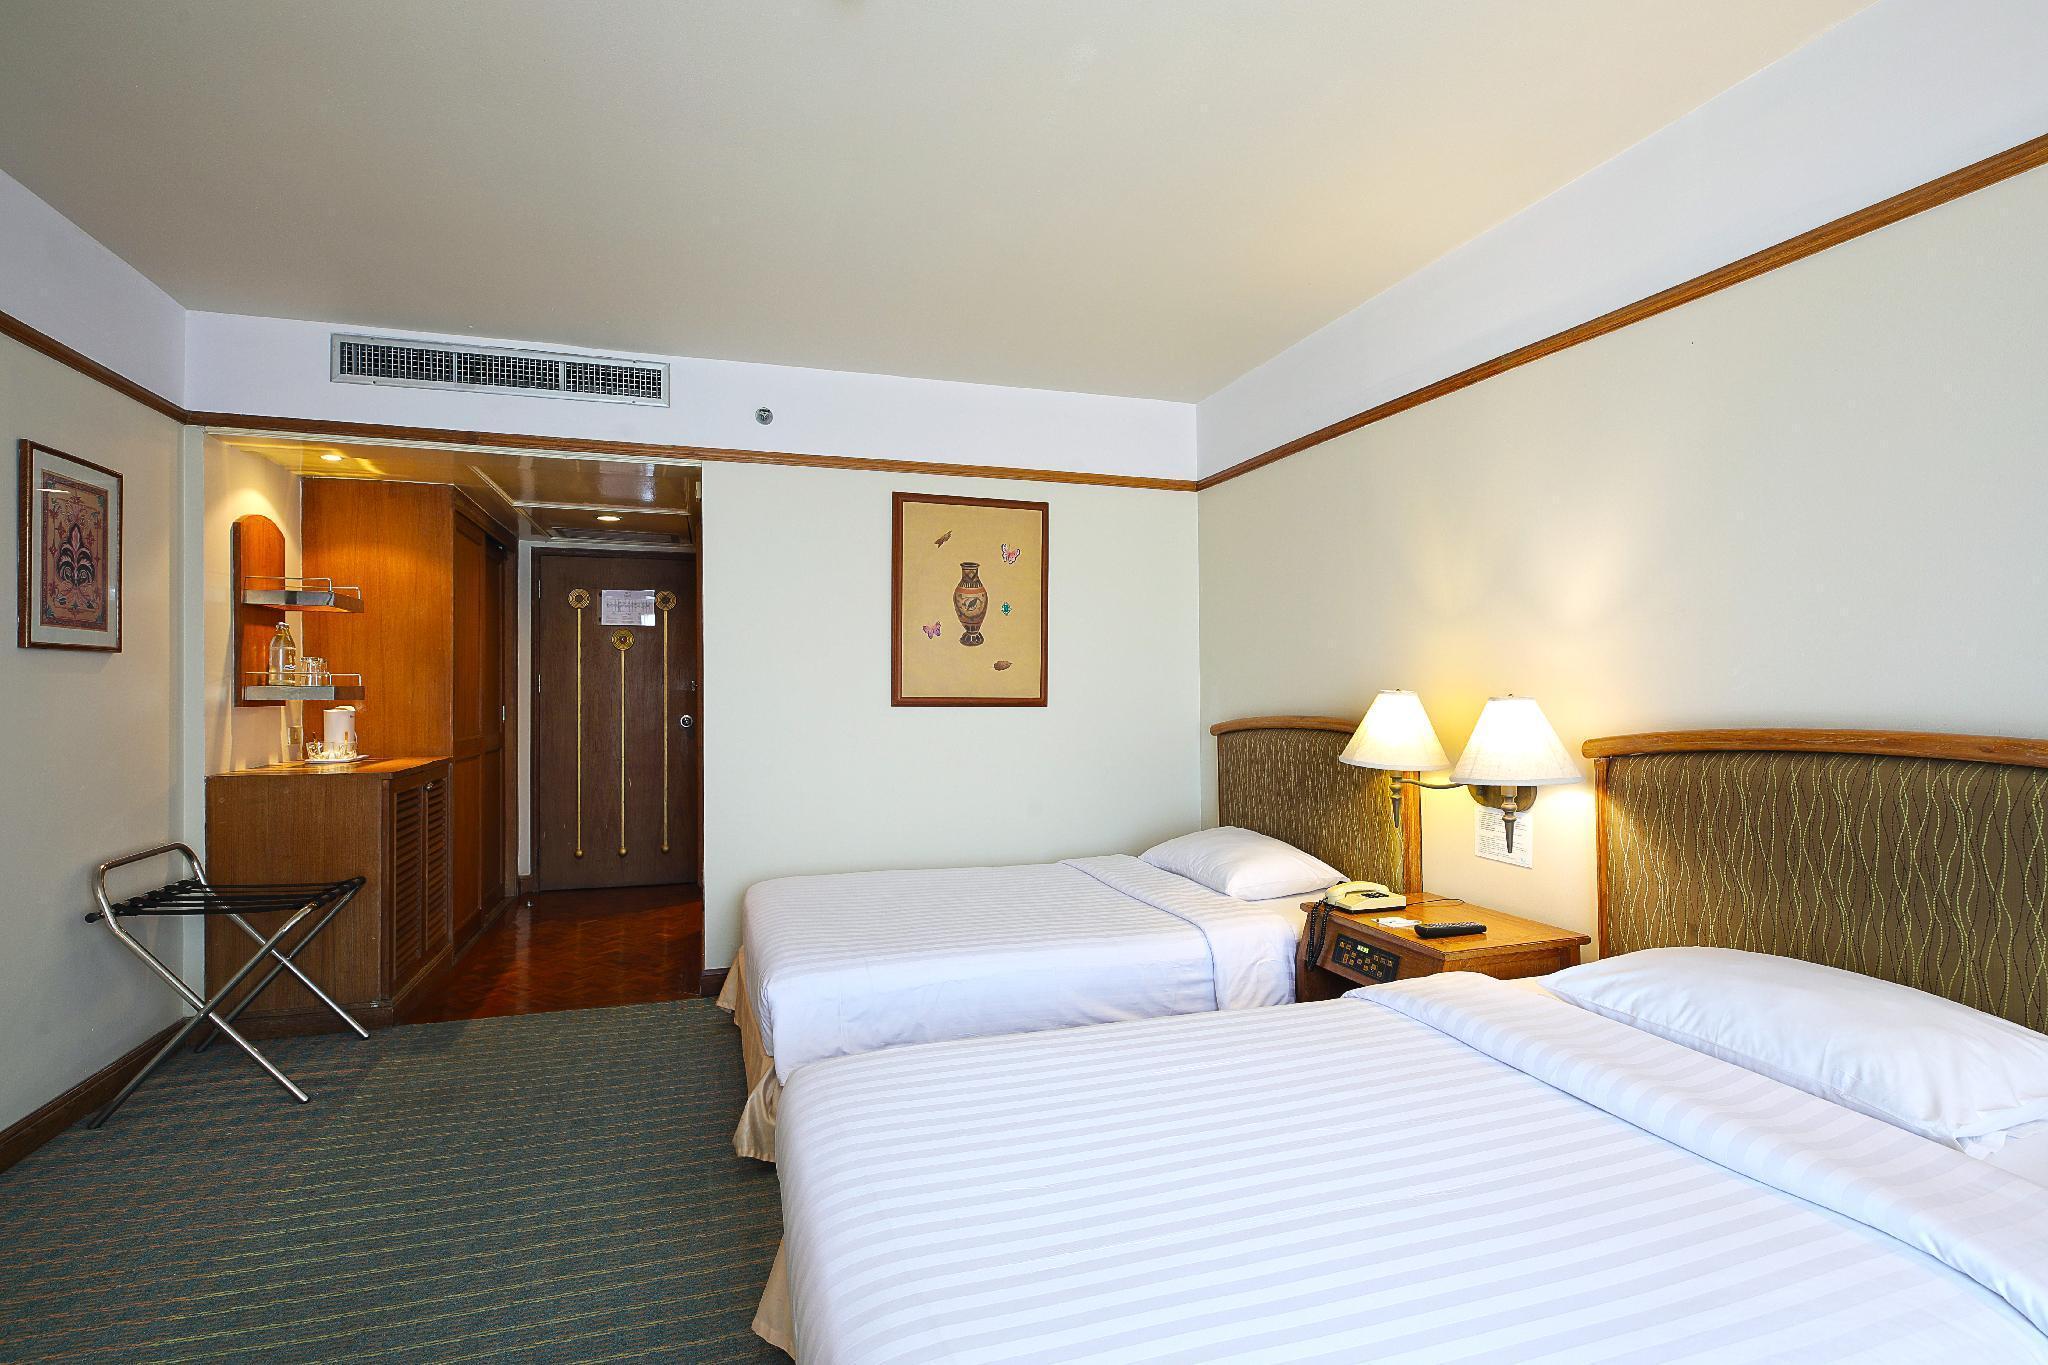 The Royal City Hotel โรงแรมรอยัล ซิตี้